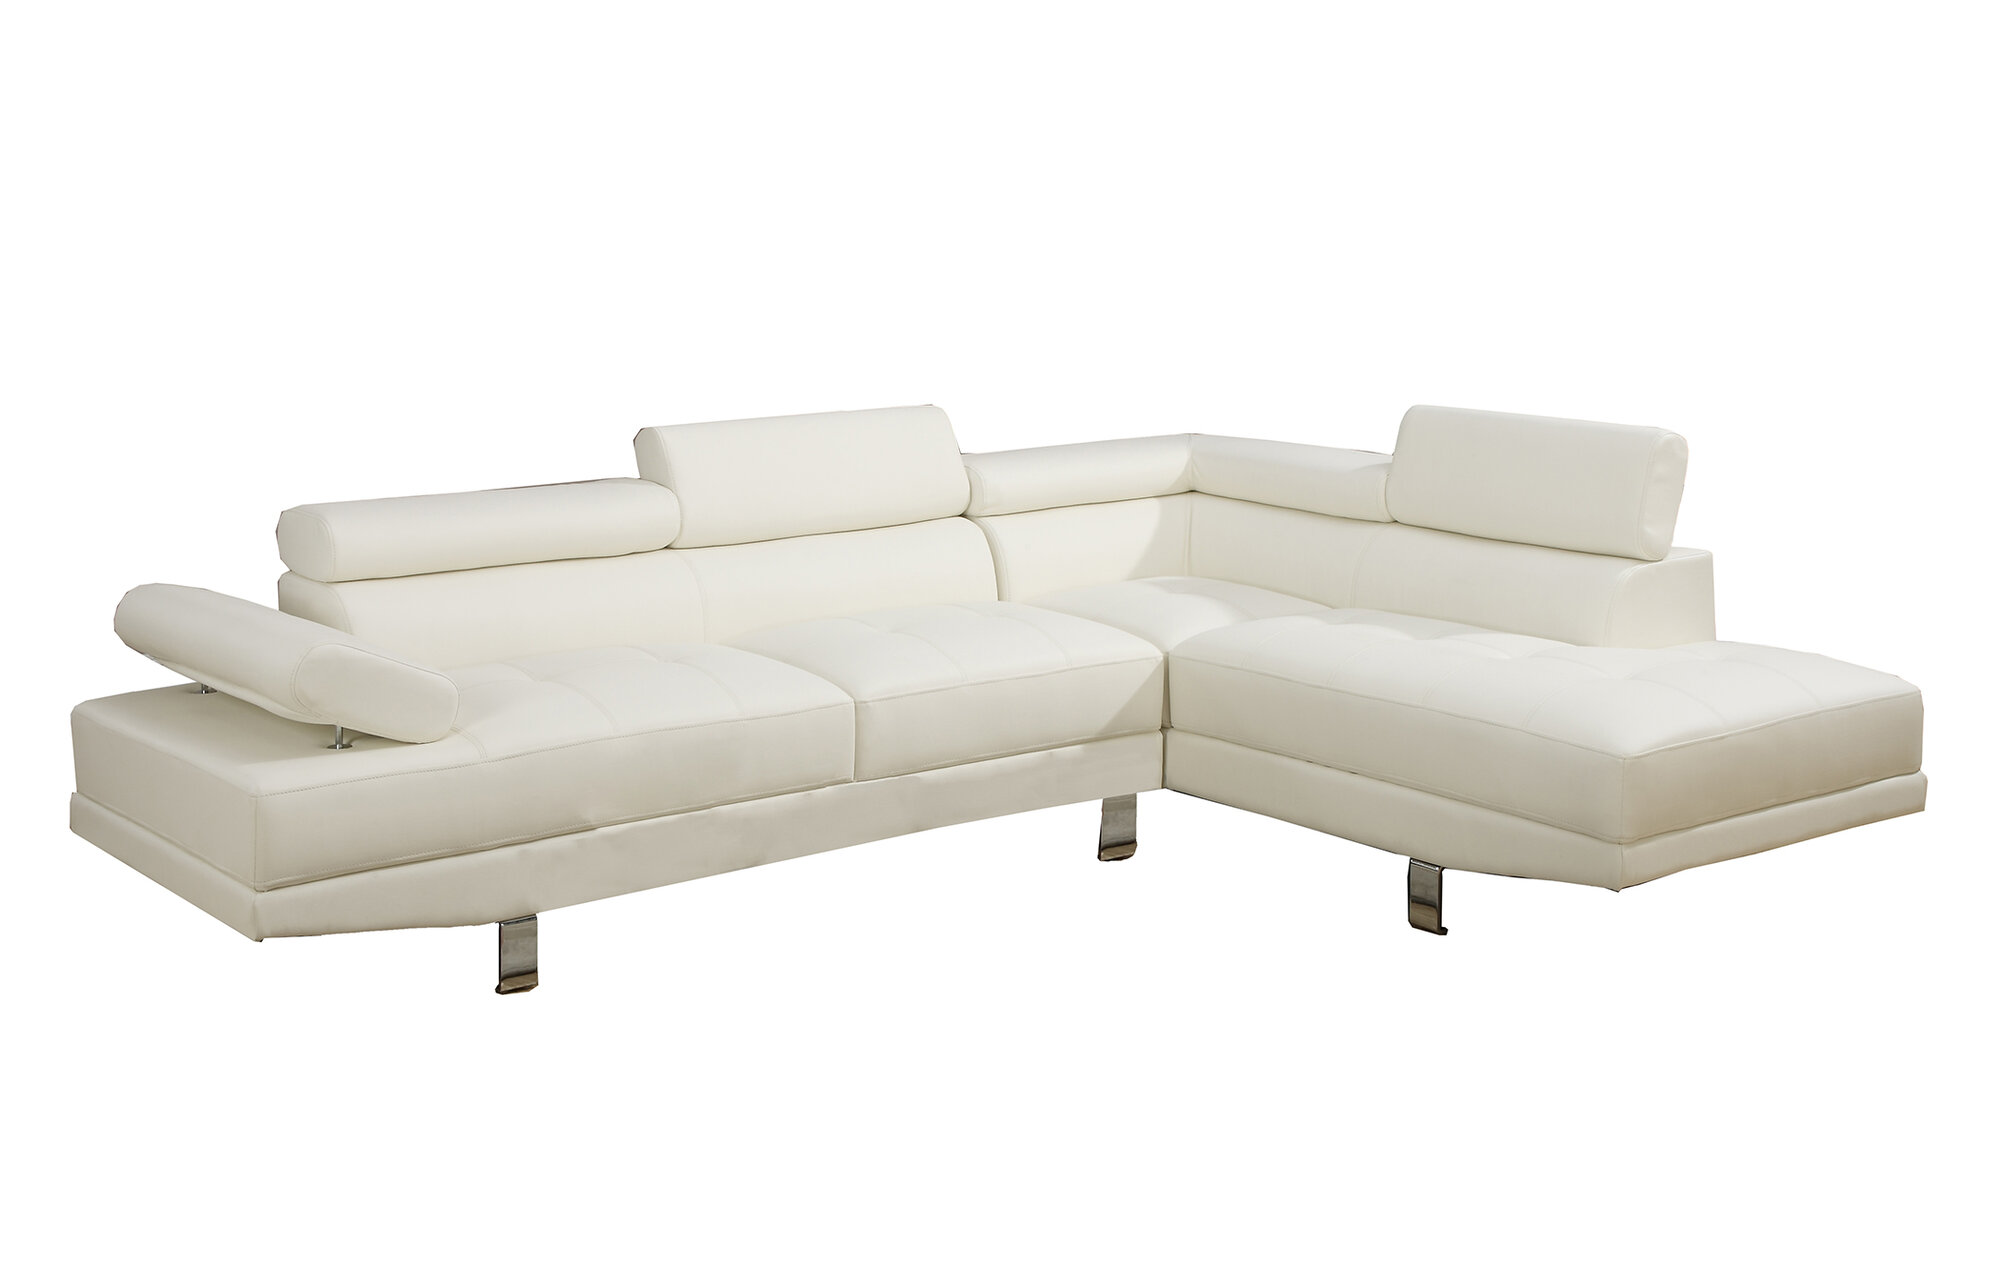 Poundex Bobkona Atlantic Sectional Sofa Ebay